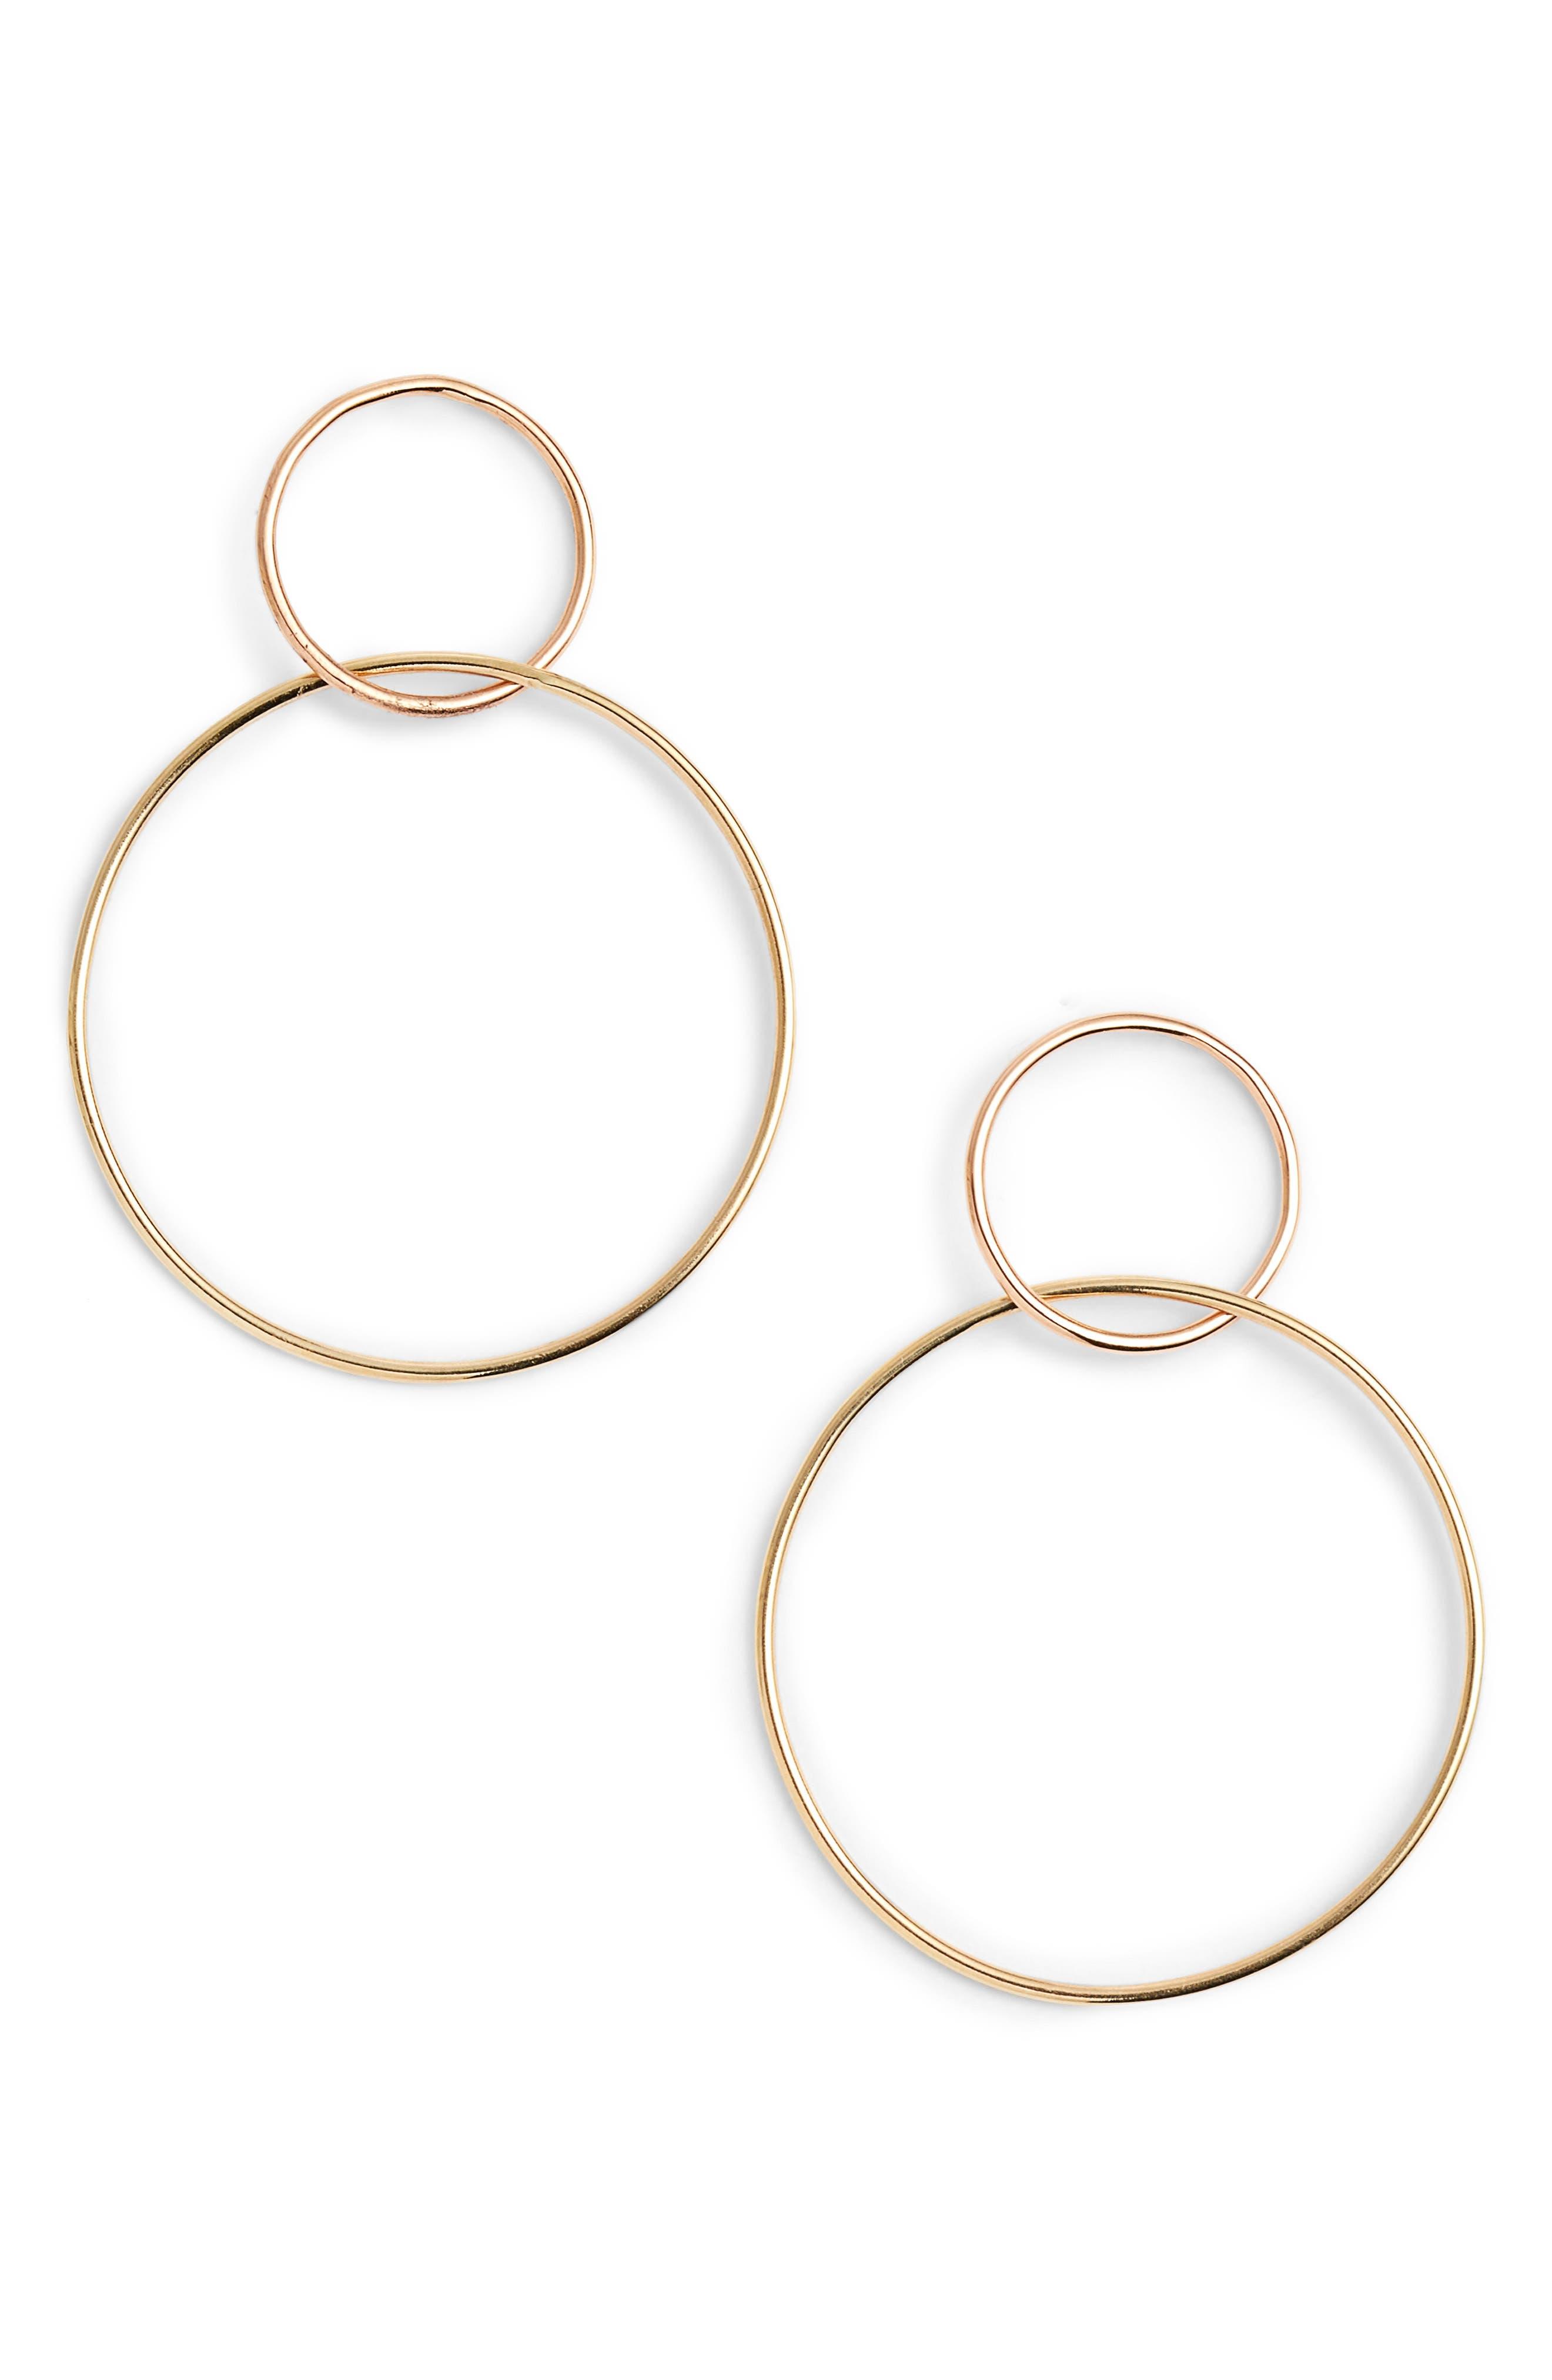 Main Image - Lana Jewelry Two Tone Double Loop Earrings